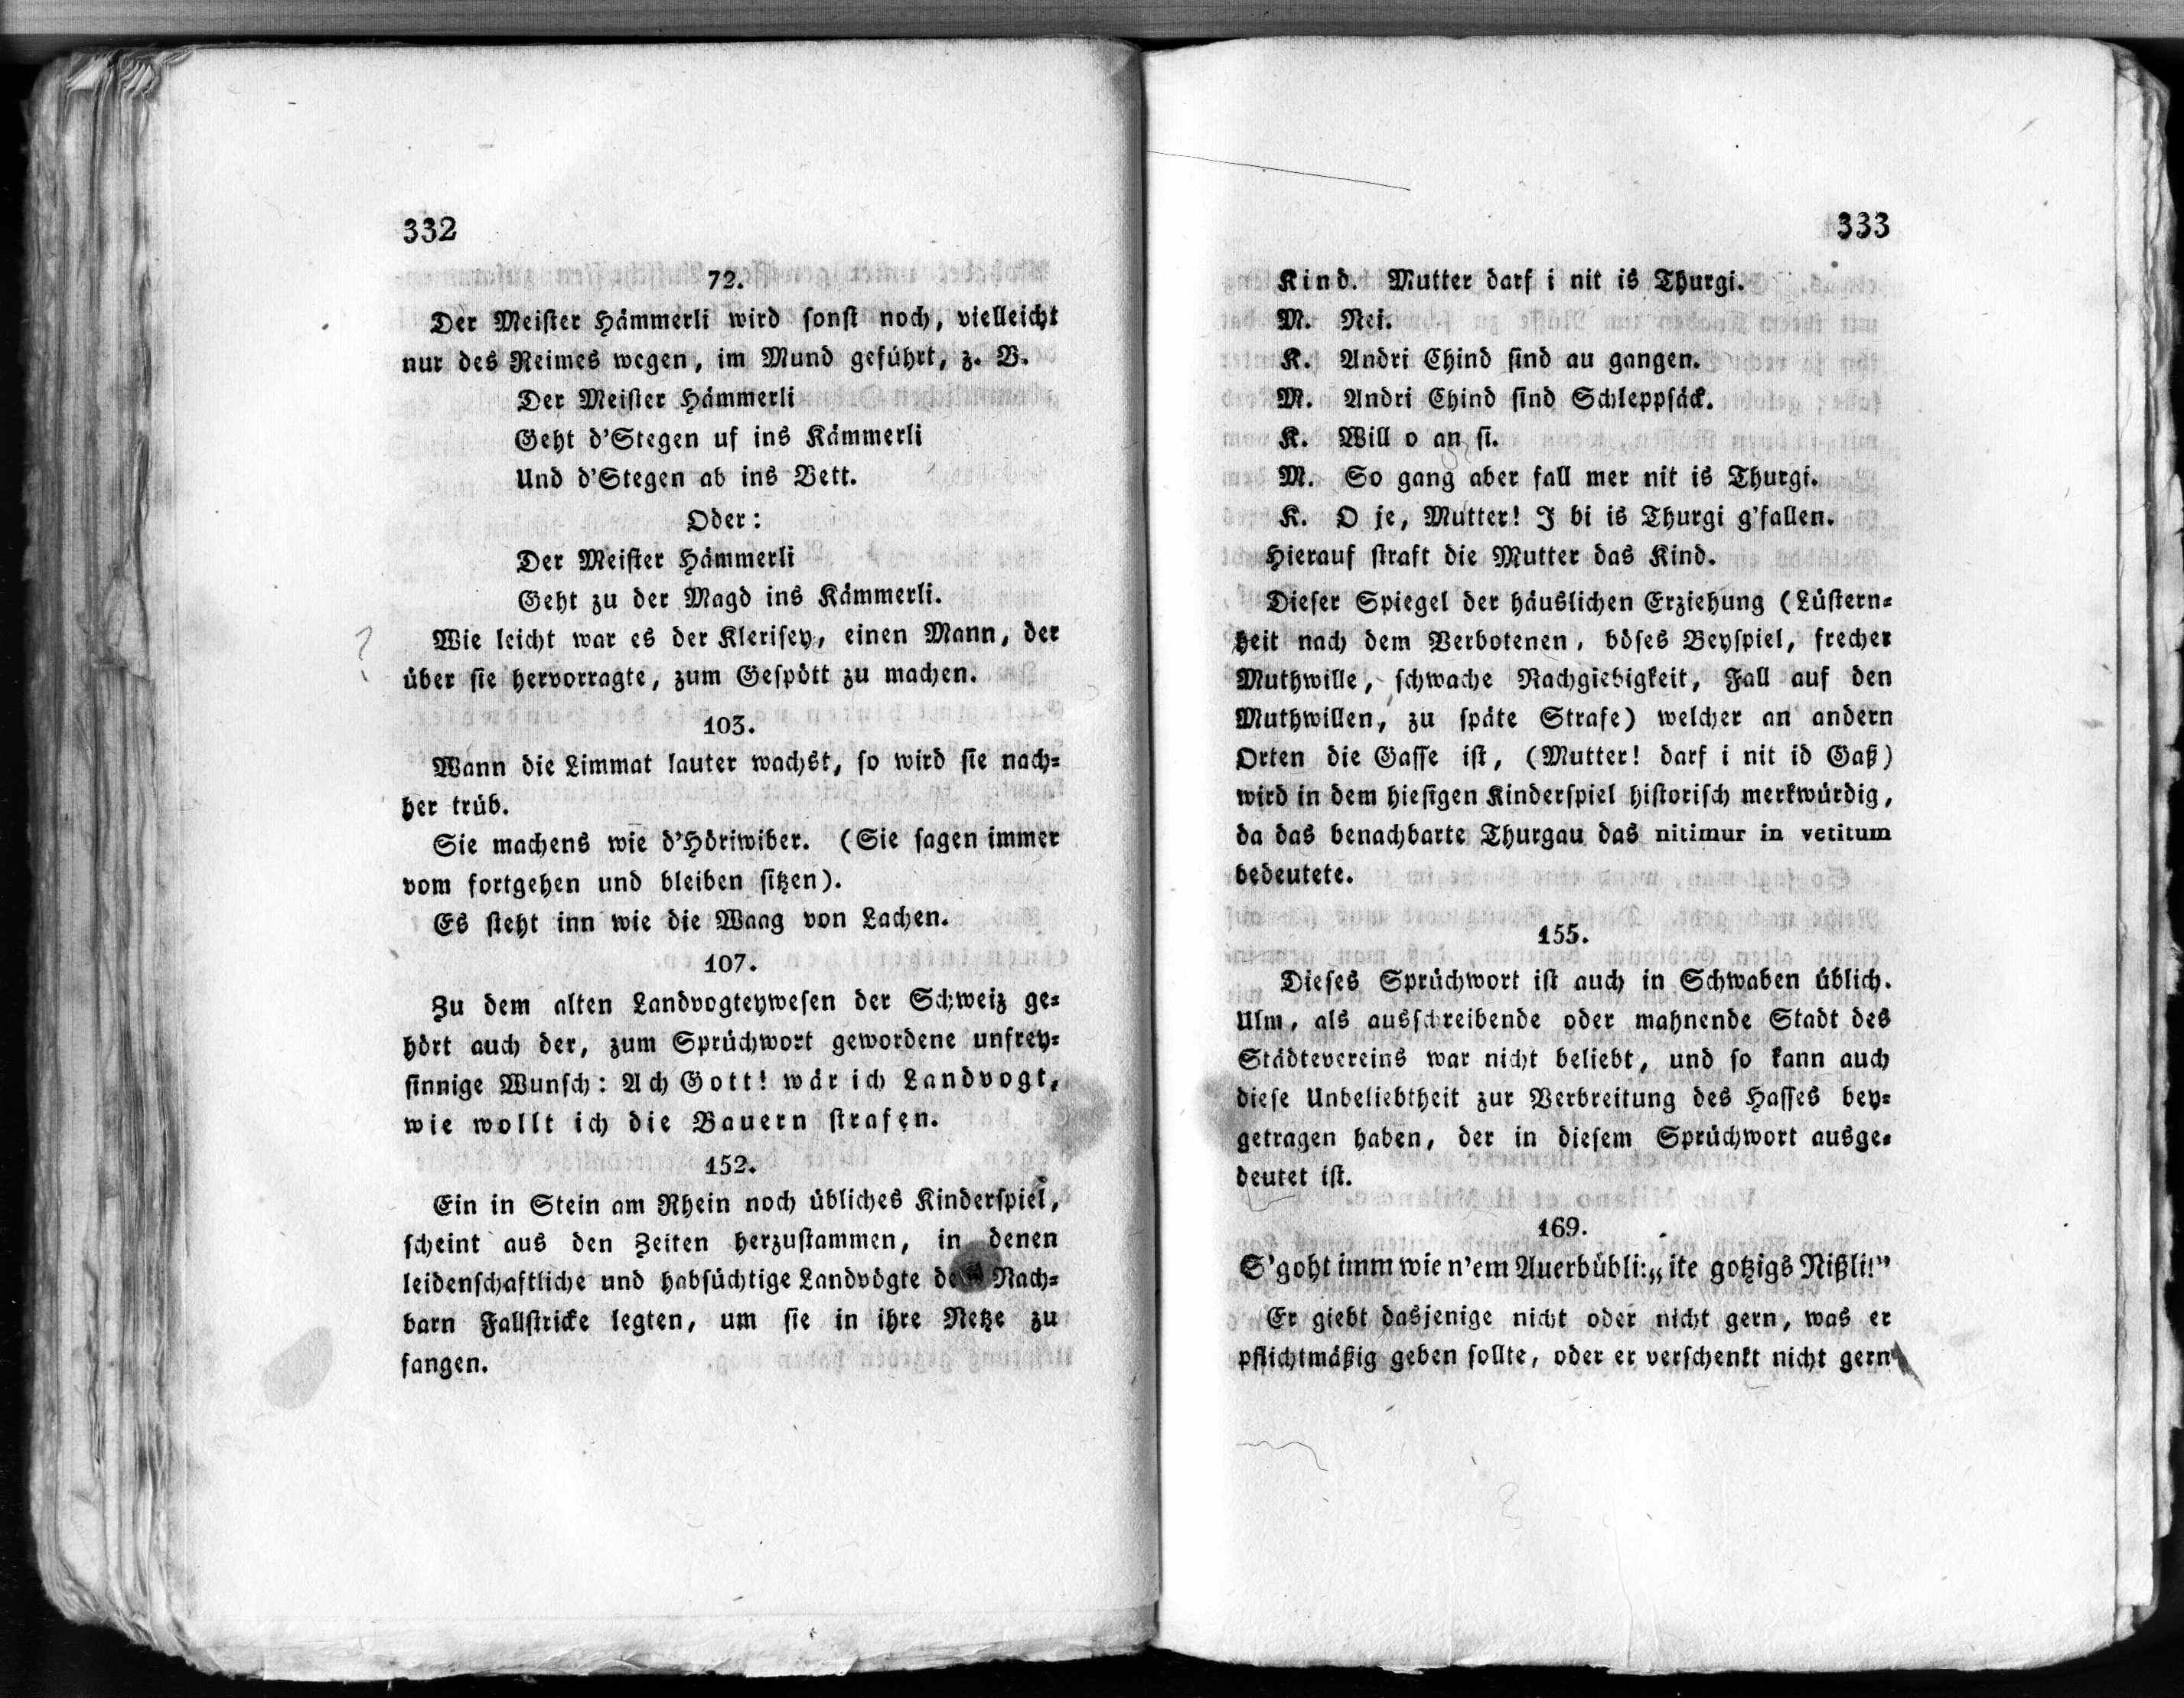 File:Kirchhofer Wahrheit und Dichtung 170.jpg - Wikimedia Commons